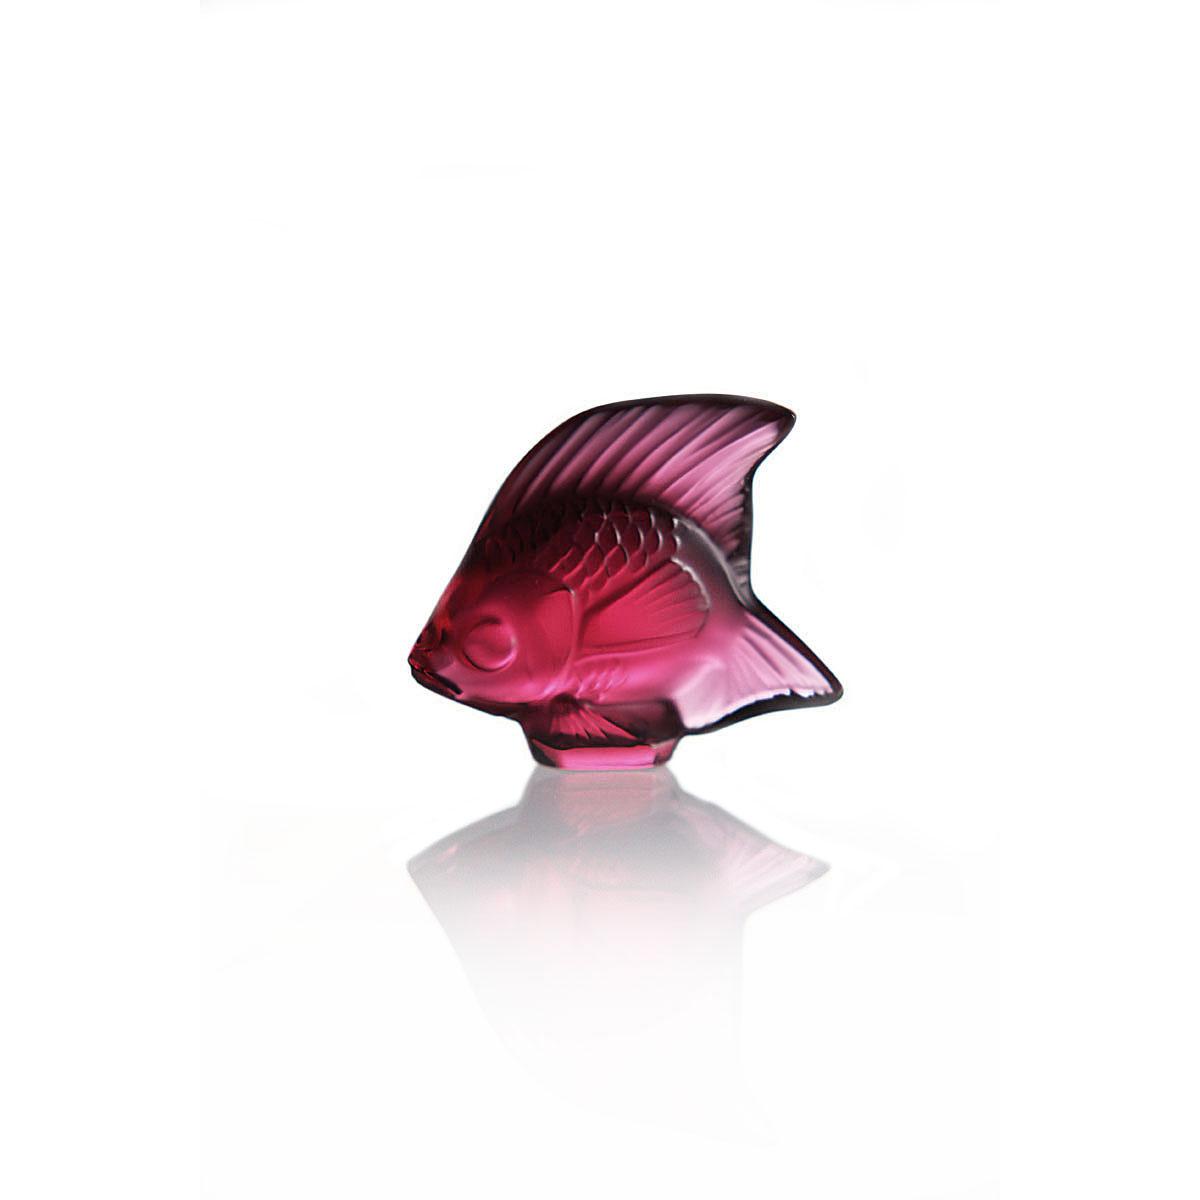 Lalique Red Fish Sculpture